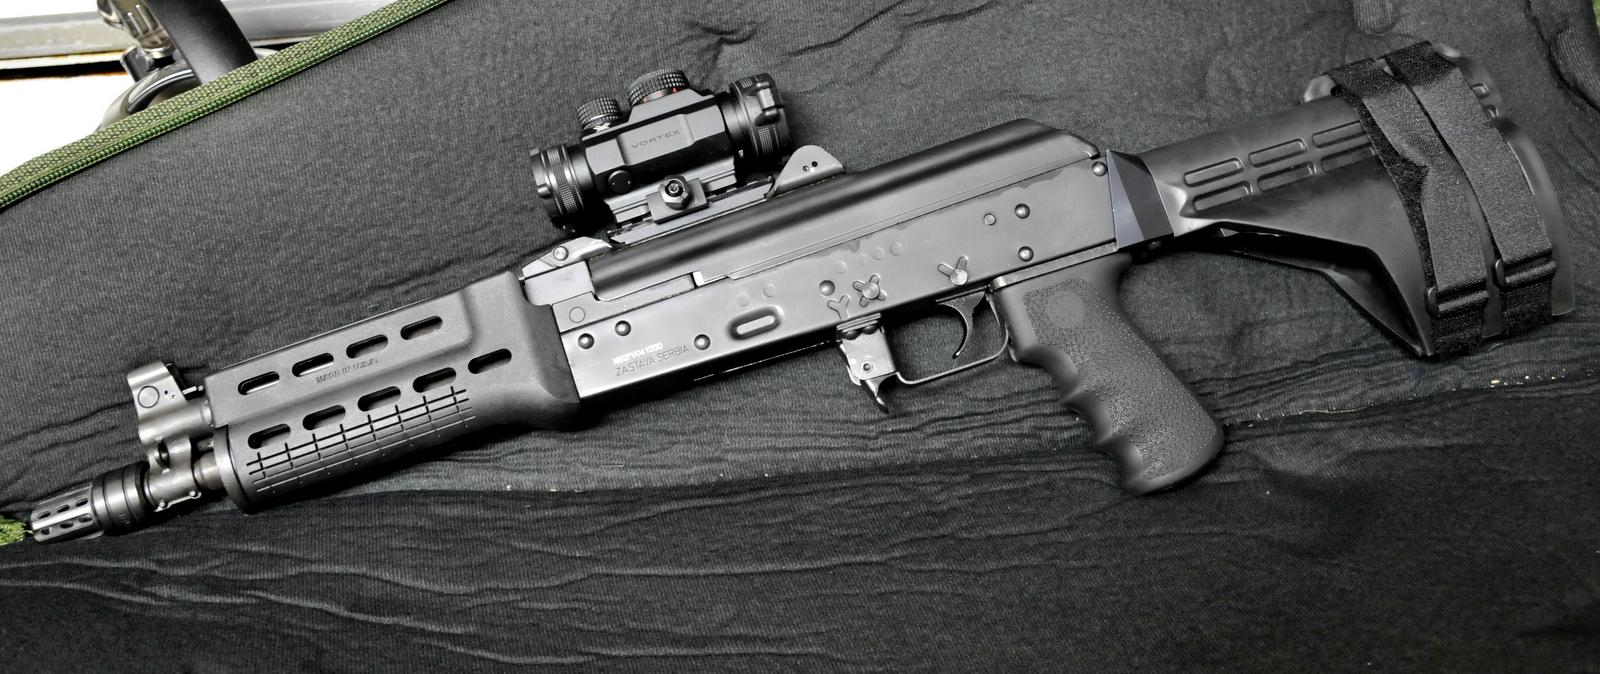 AR15 vs PAP M92 pistol SHTF - Survivalist Forum